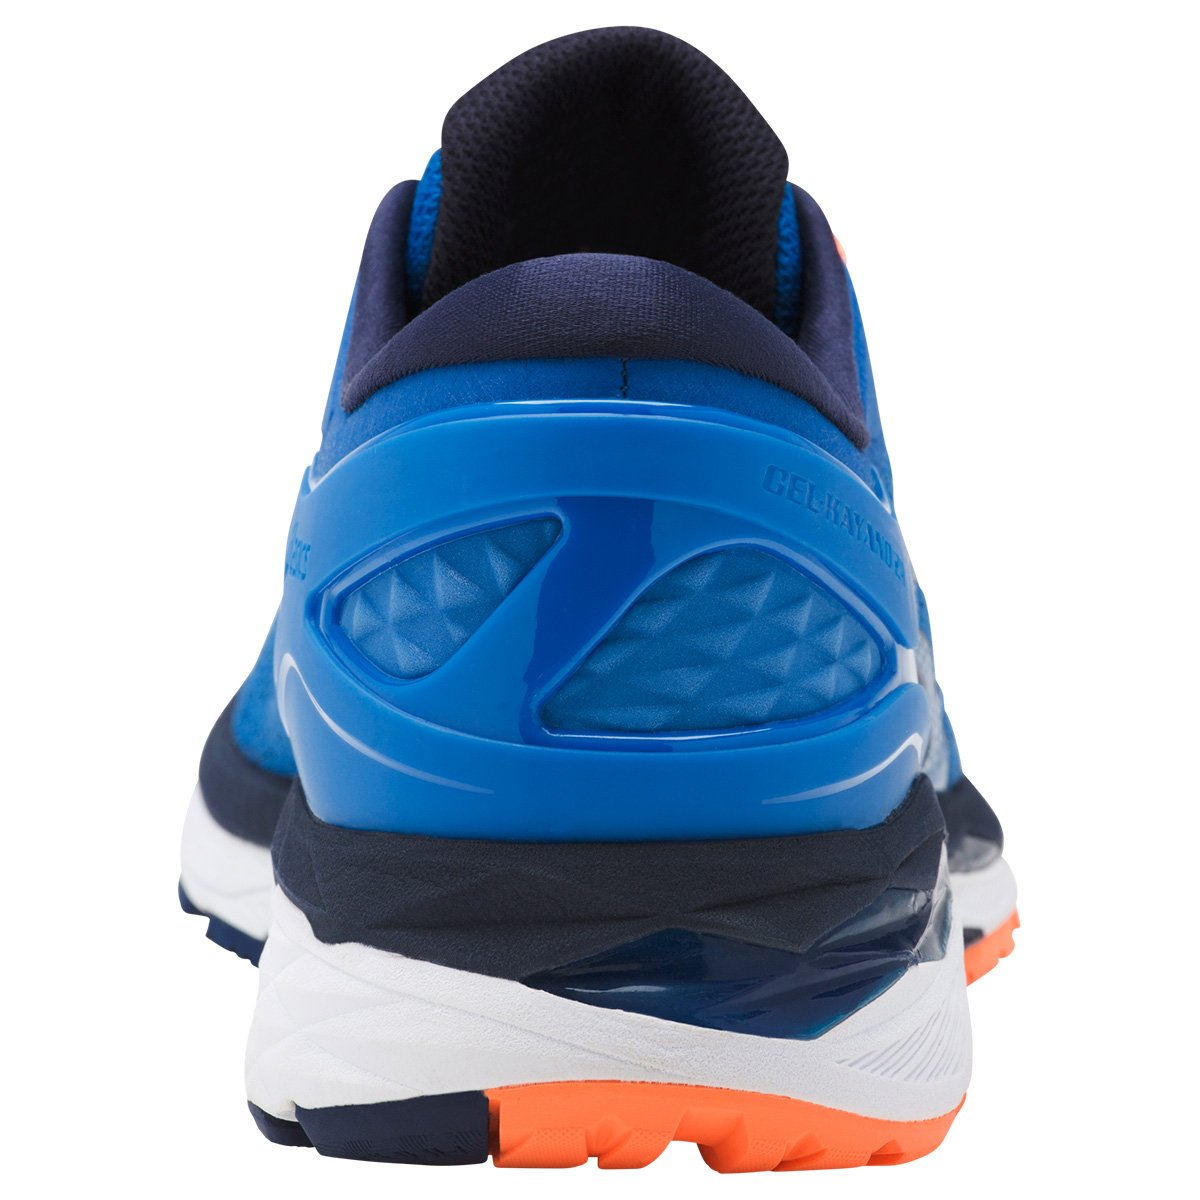 Tênis Asics Gel-Kayano 24 Masculino - Azul e Laranja - Compre Agora ... 49d973f43e75d